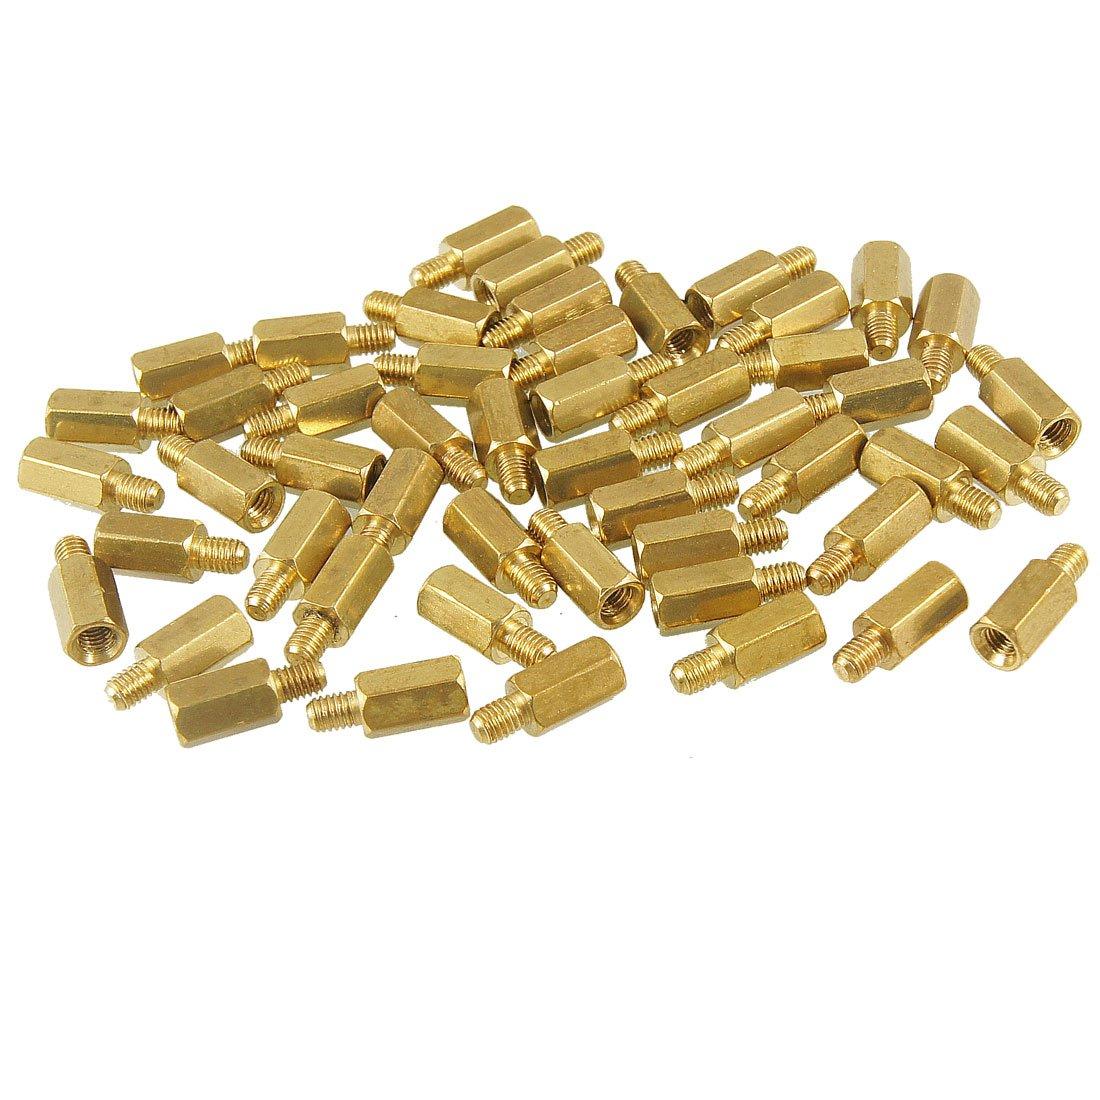 EWS M3 Male x M3 Female 8mm Long Hexagonal Brass PCB Standoffs Spacers 50 Pcs clos 50 pcs brass screw hexagonal stand off spacer m3 male x m3 female 12mm body length